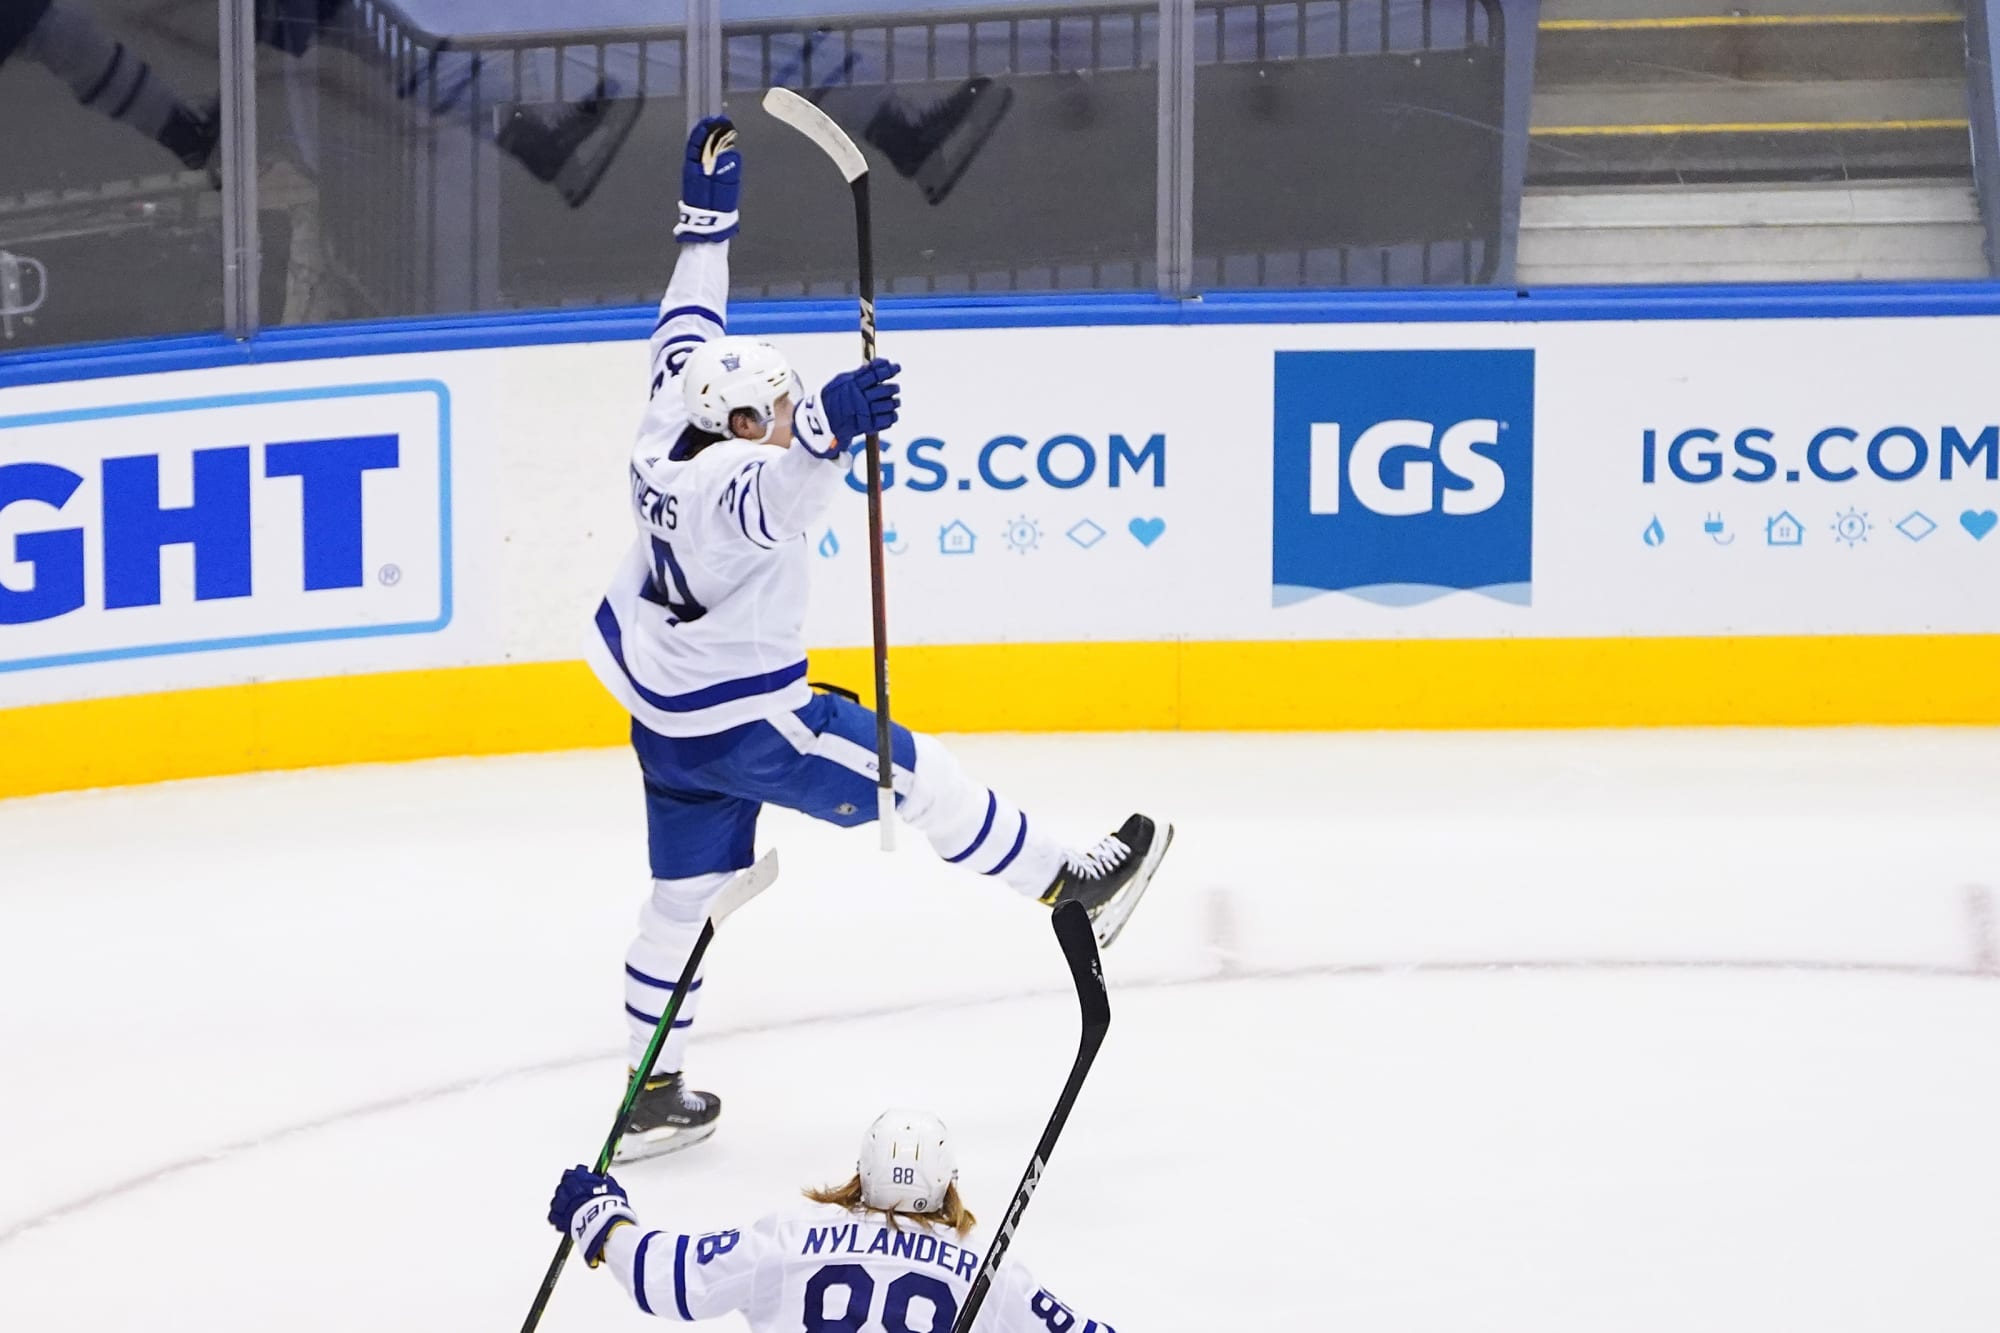 Toronto Maple Leafs: Auston Matthews Is Like Mario Lemieux